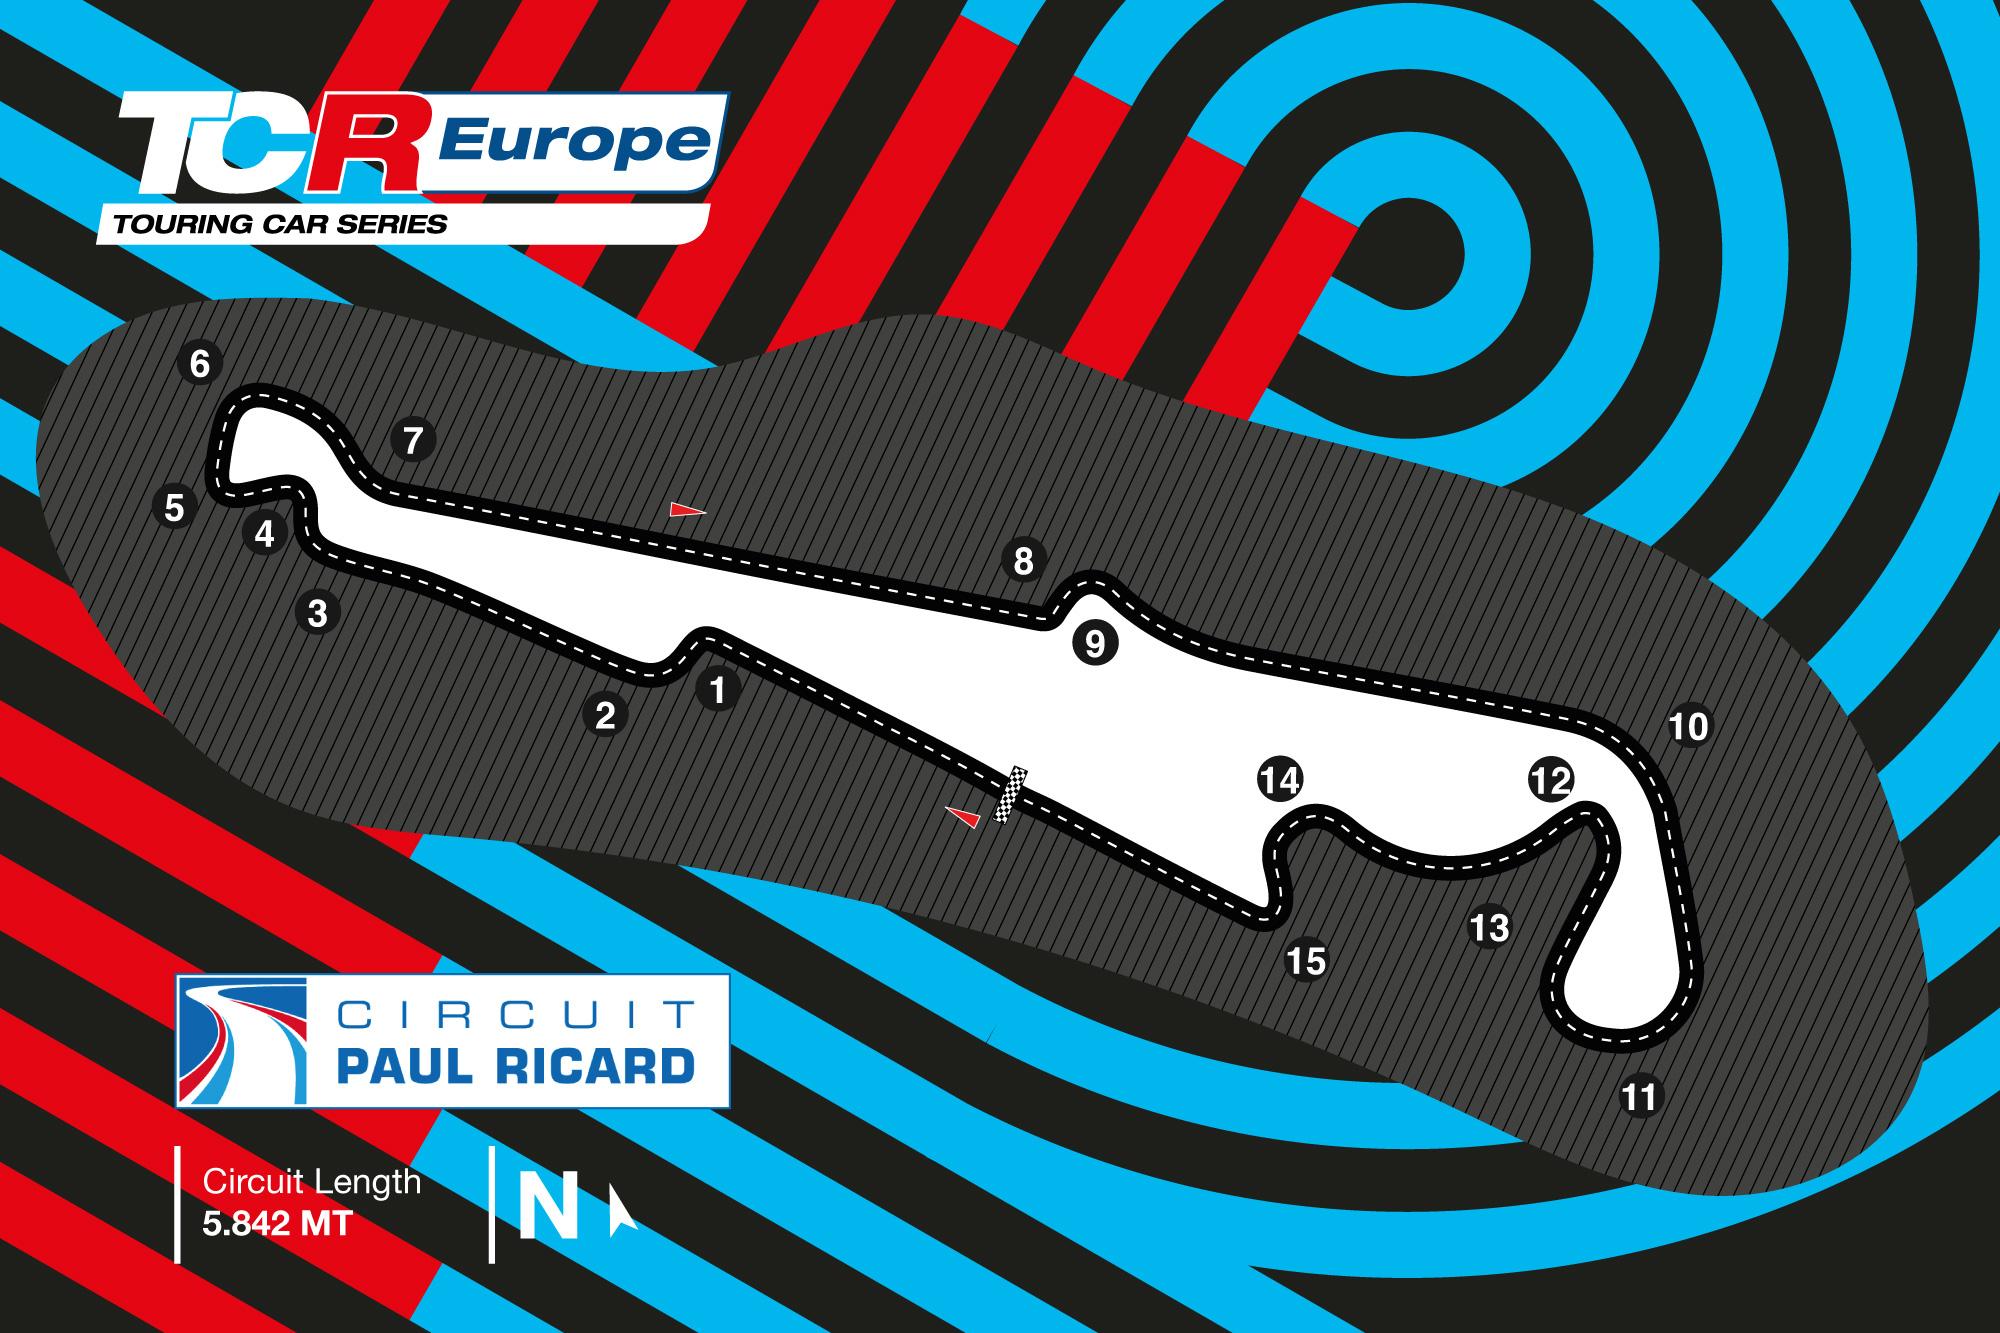 2021_Europe_Tracks_02LeCastellet_f395628a745eaef79e2f15c0530d9c40